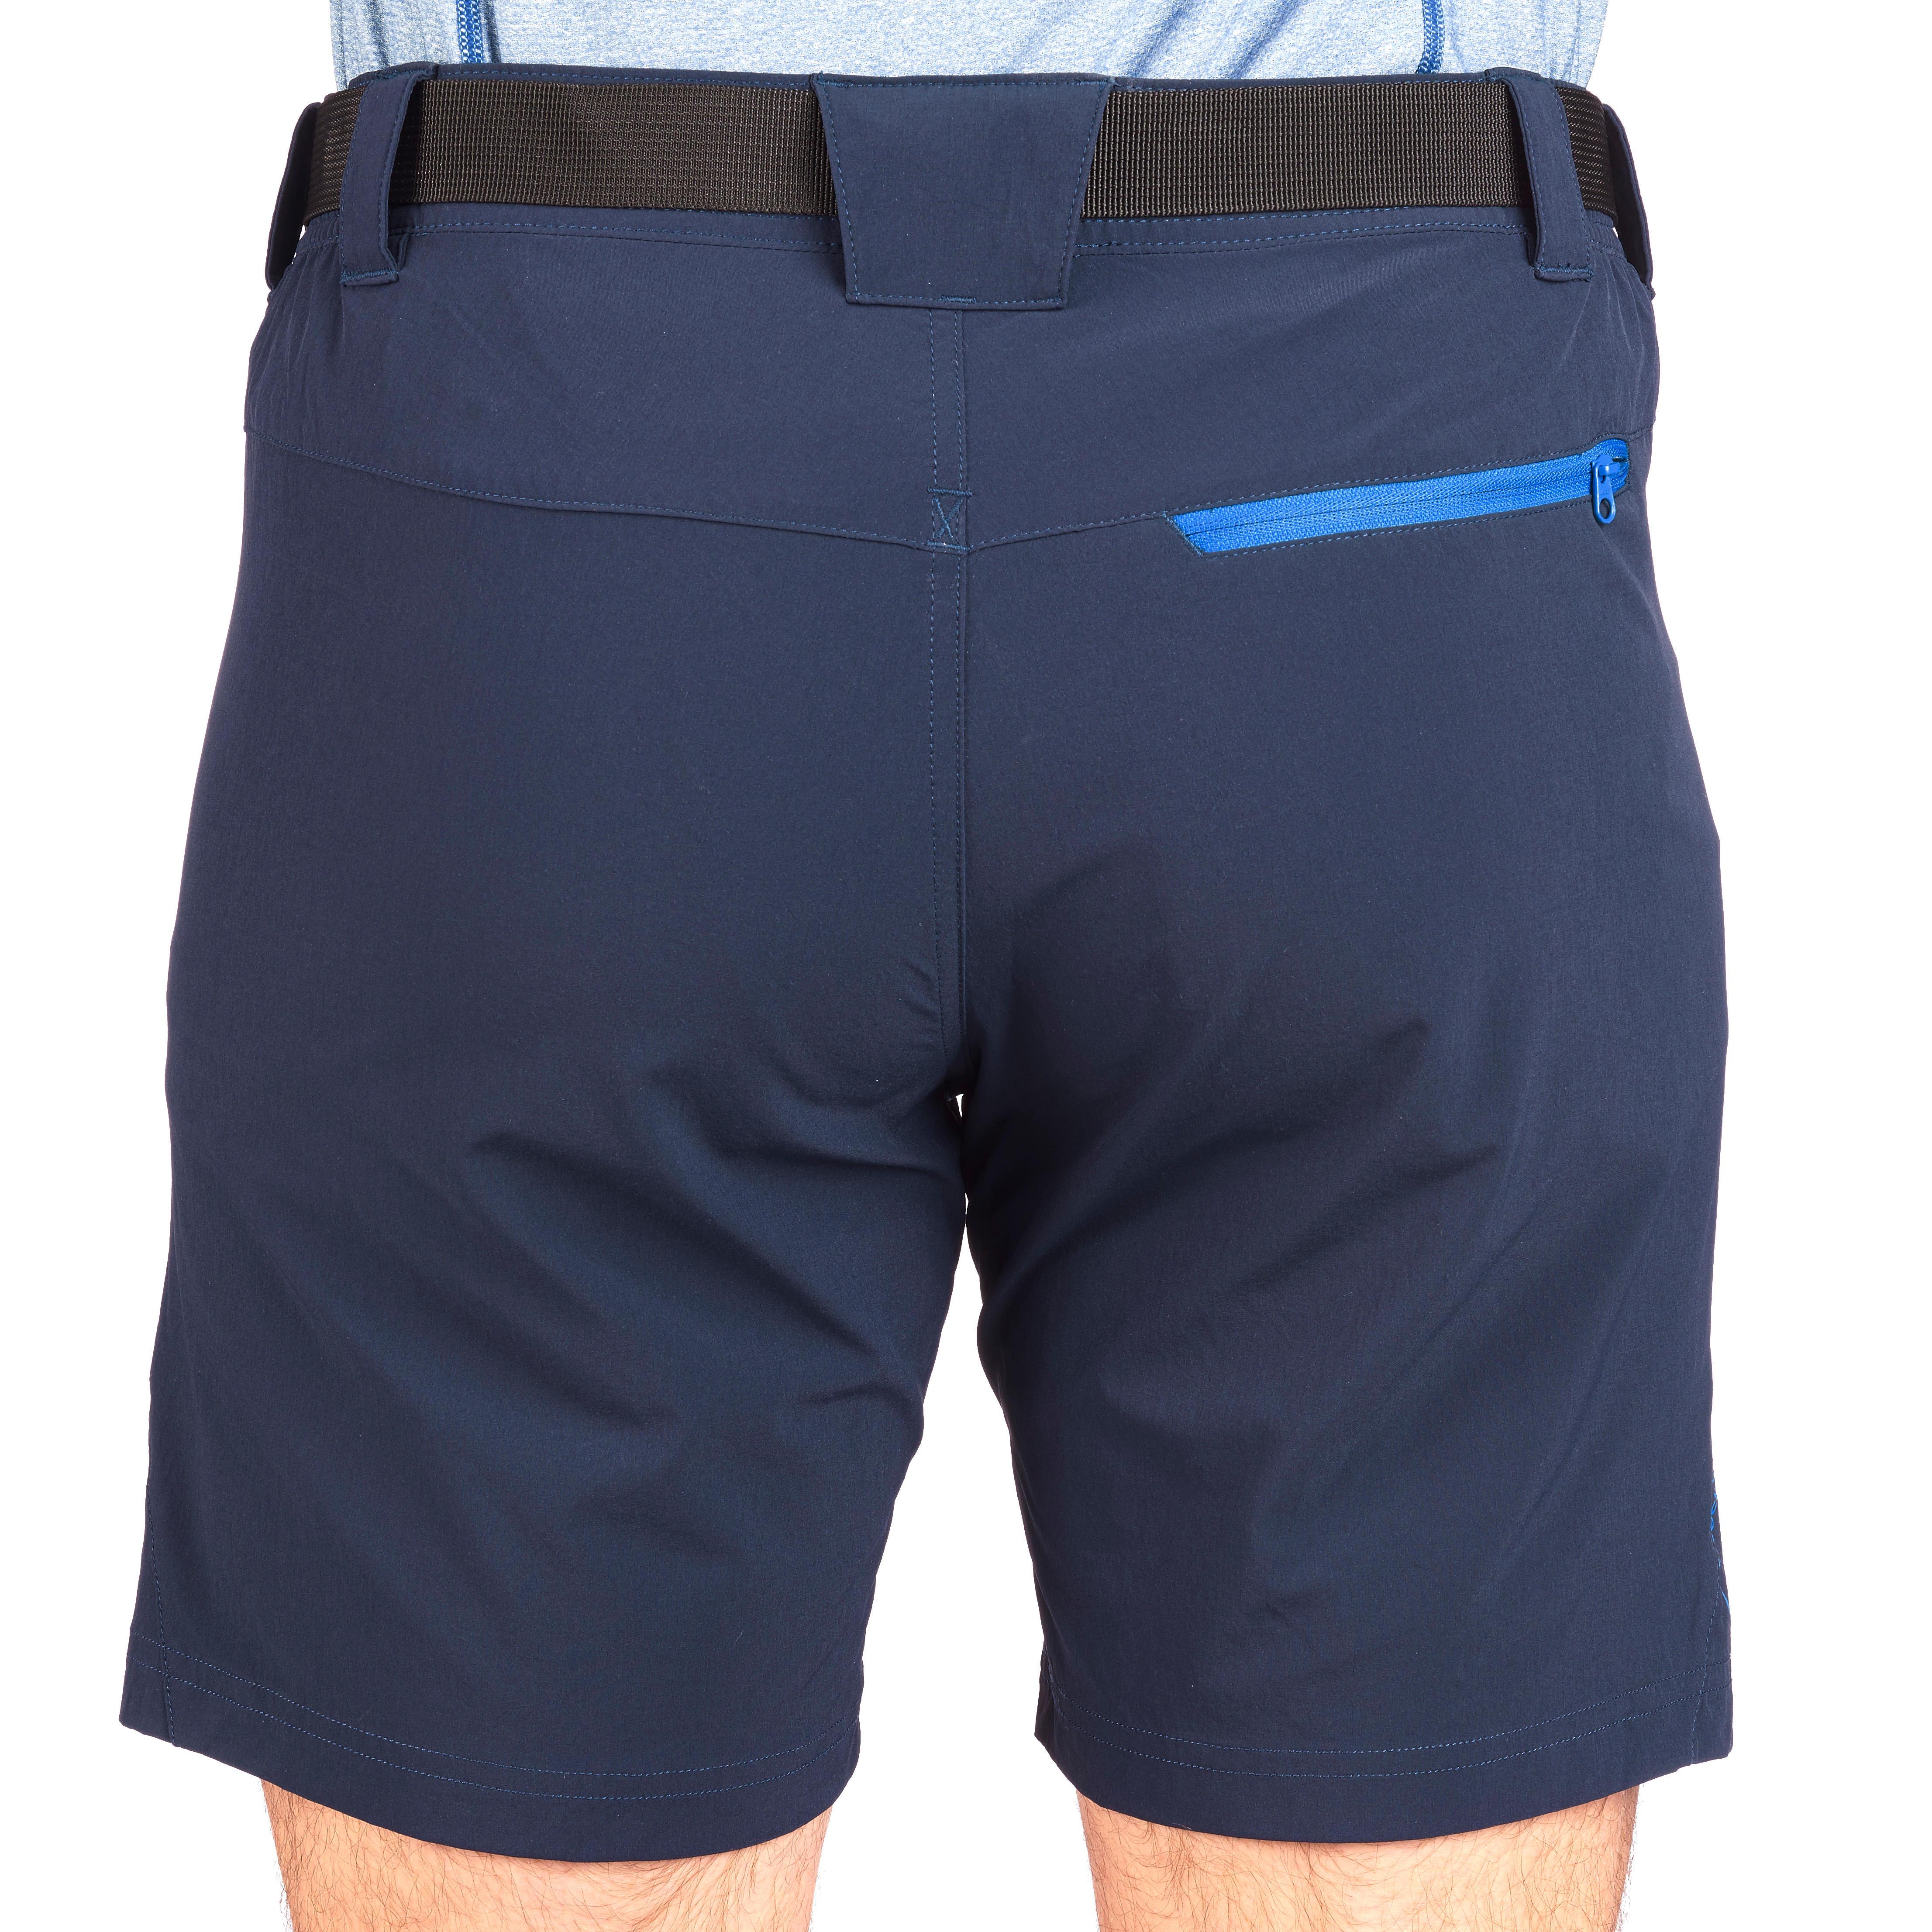 MH500 Men's Short Mountain Walking Shorts - Navy.